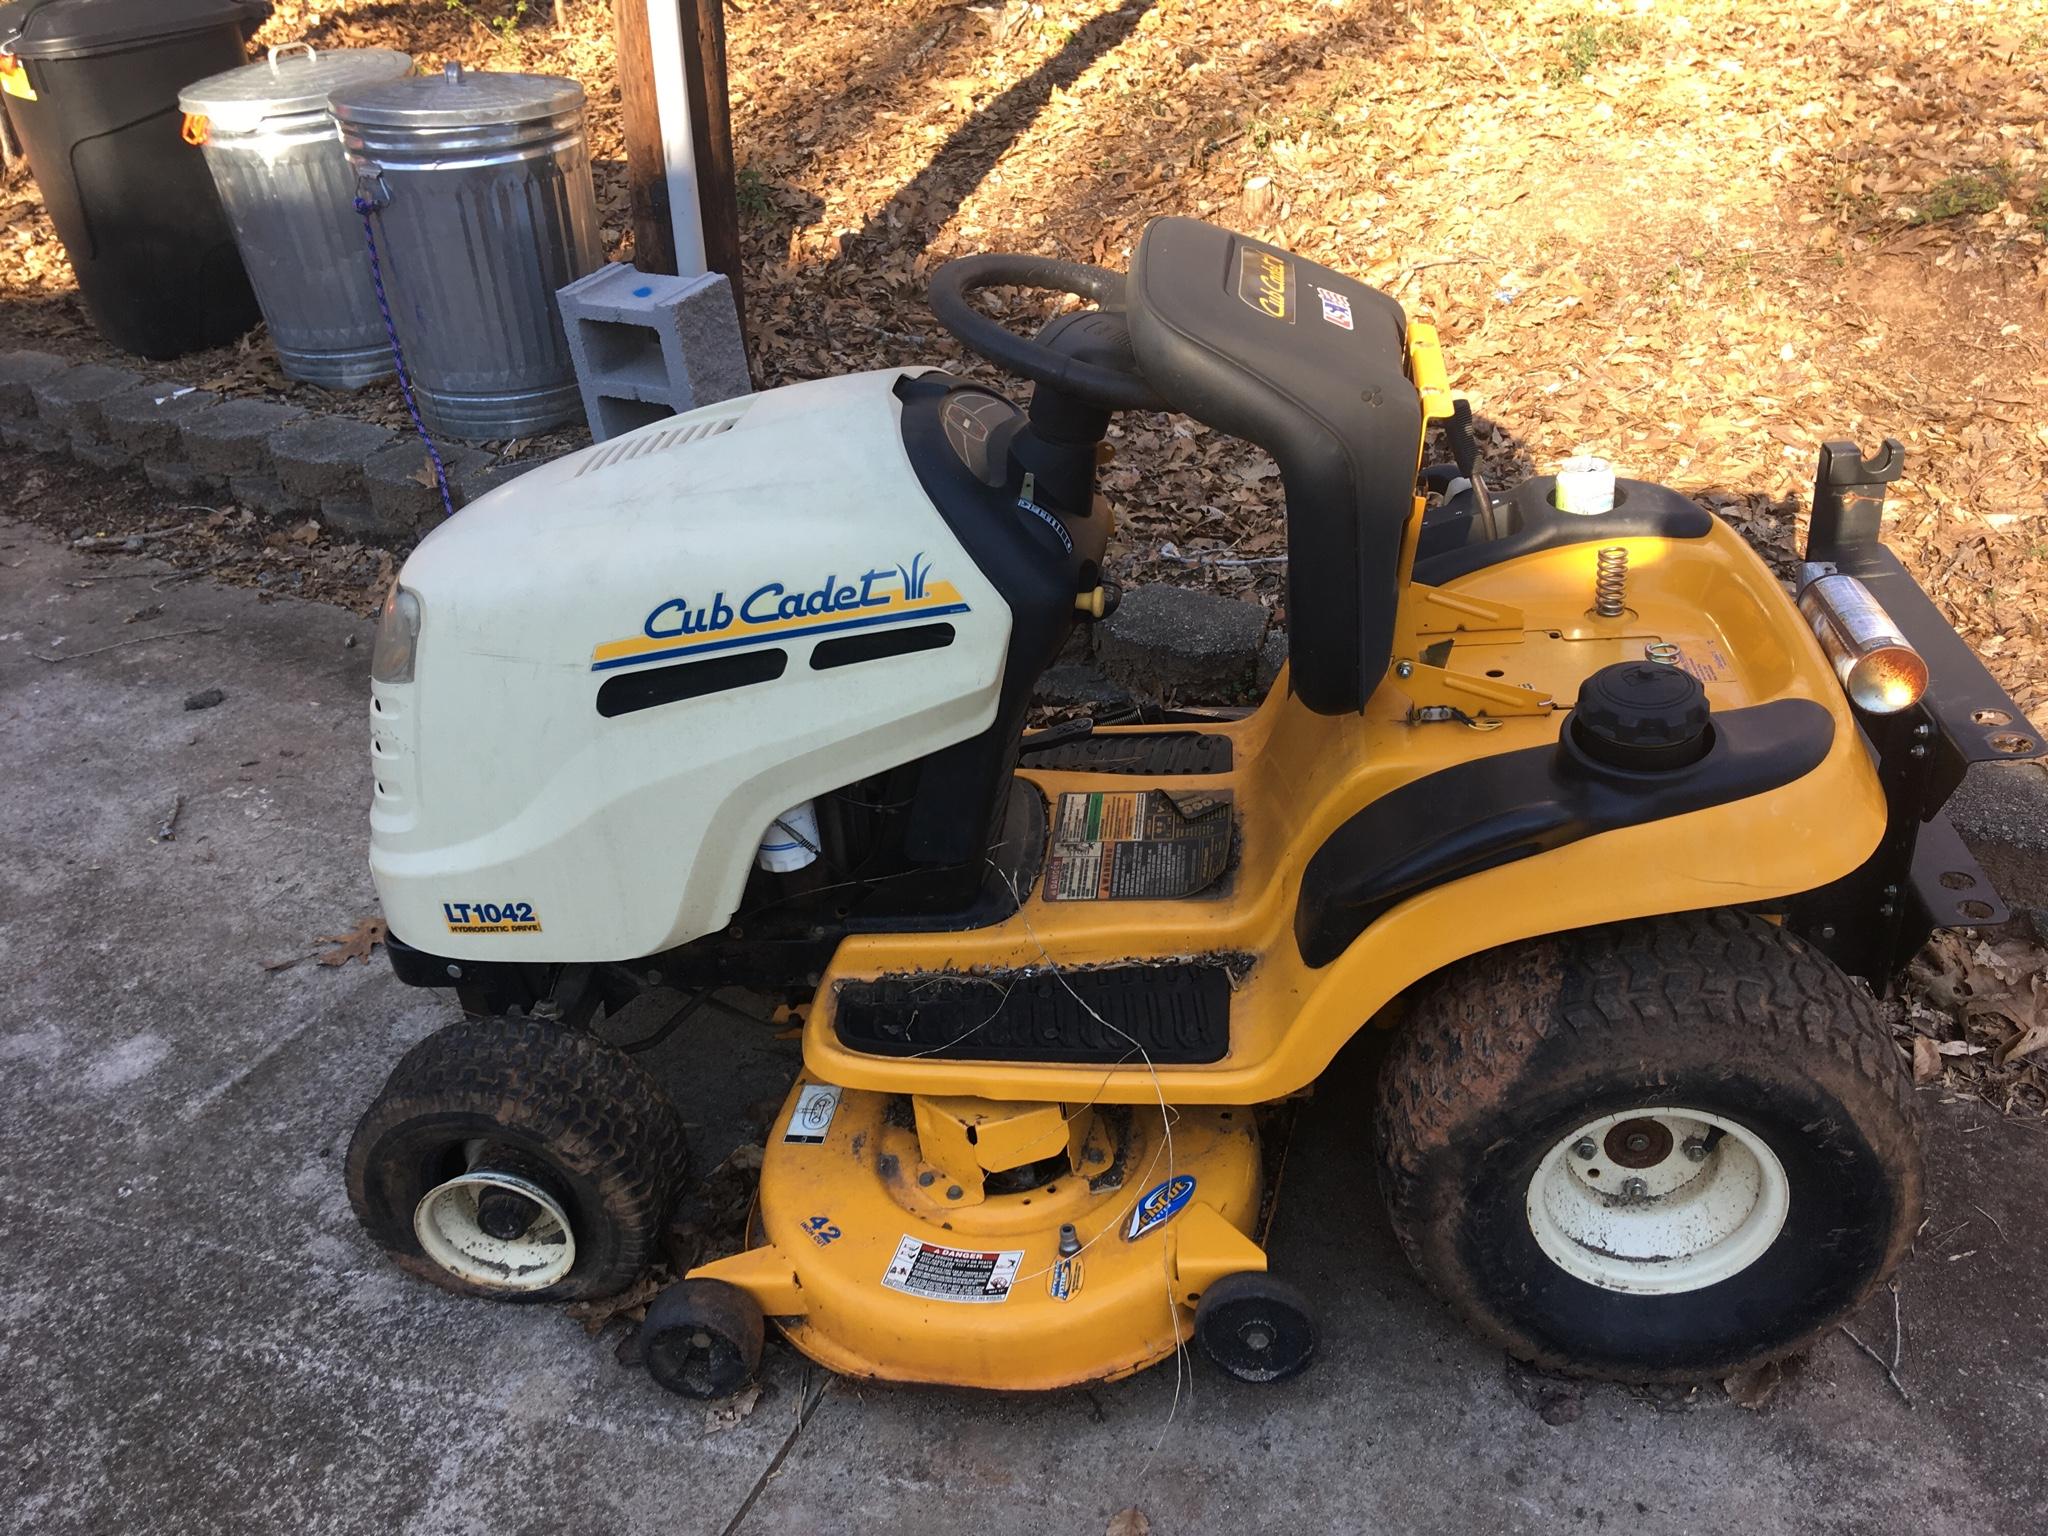 NC/SC - Lawn mower cub cadet lt1042 | CarolinaFirearmsForum